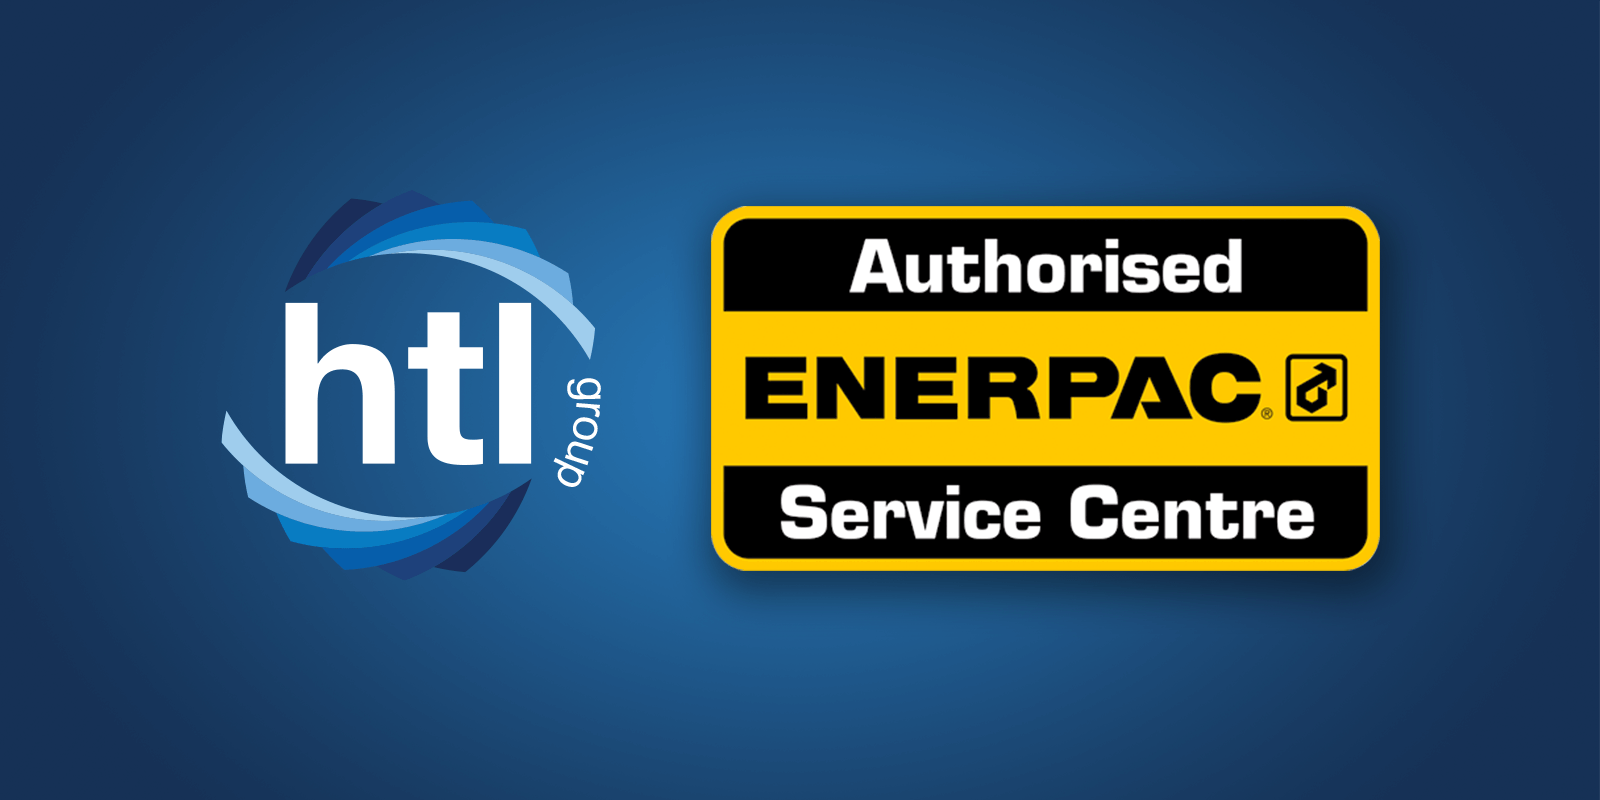 Enerpac Service Centre